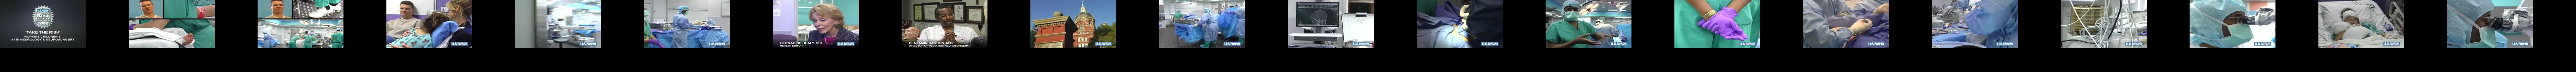 Brain Surgery at Johns Hopkins with Dr  Ben Carson- Medical Videos